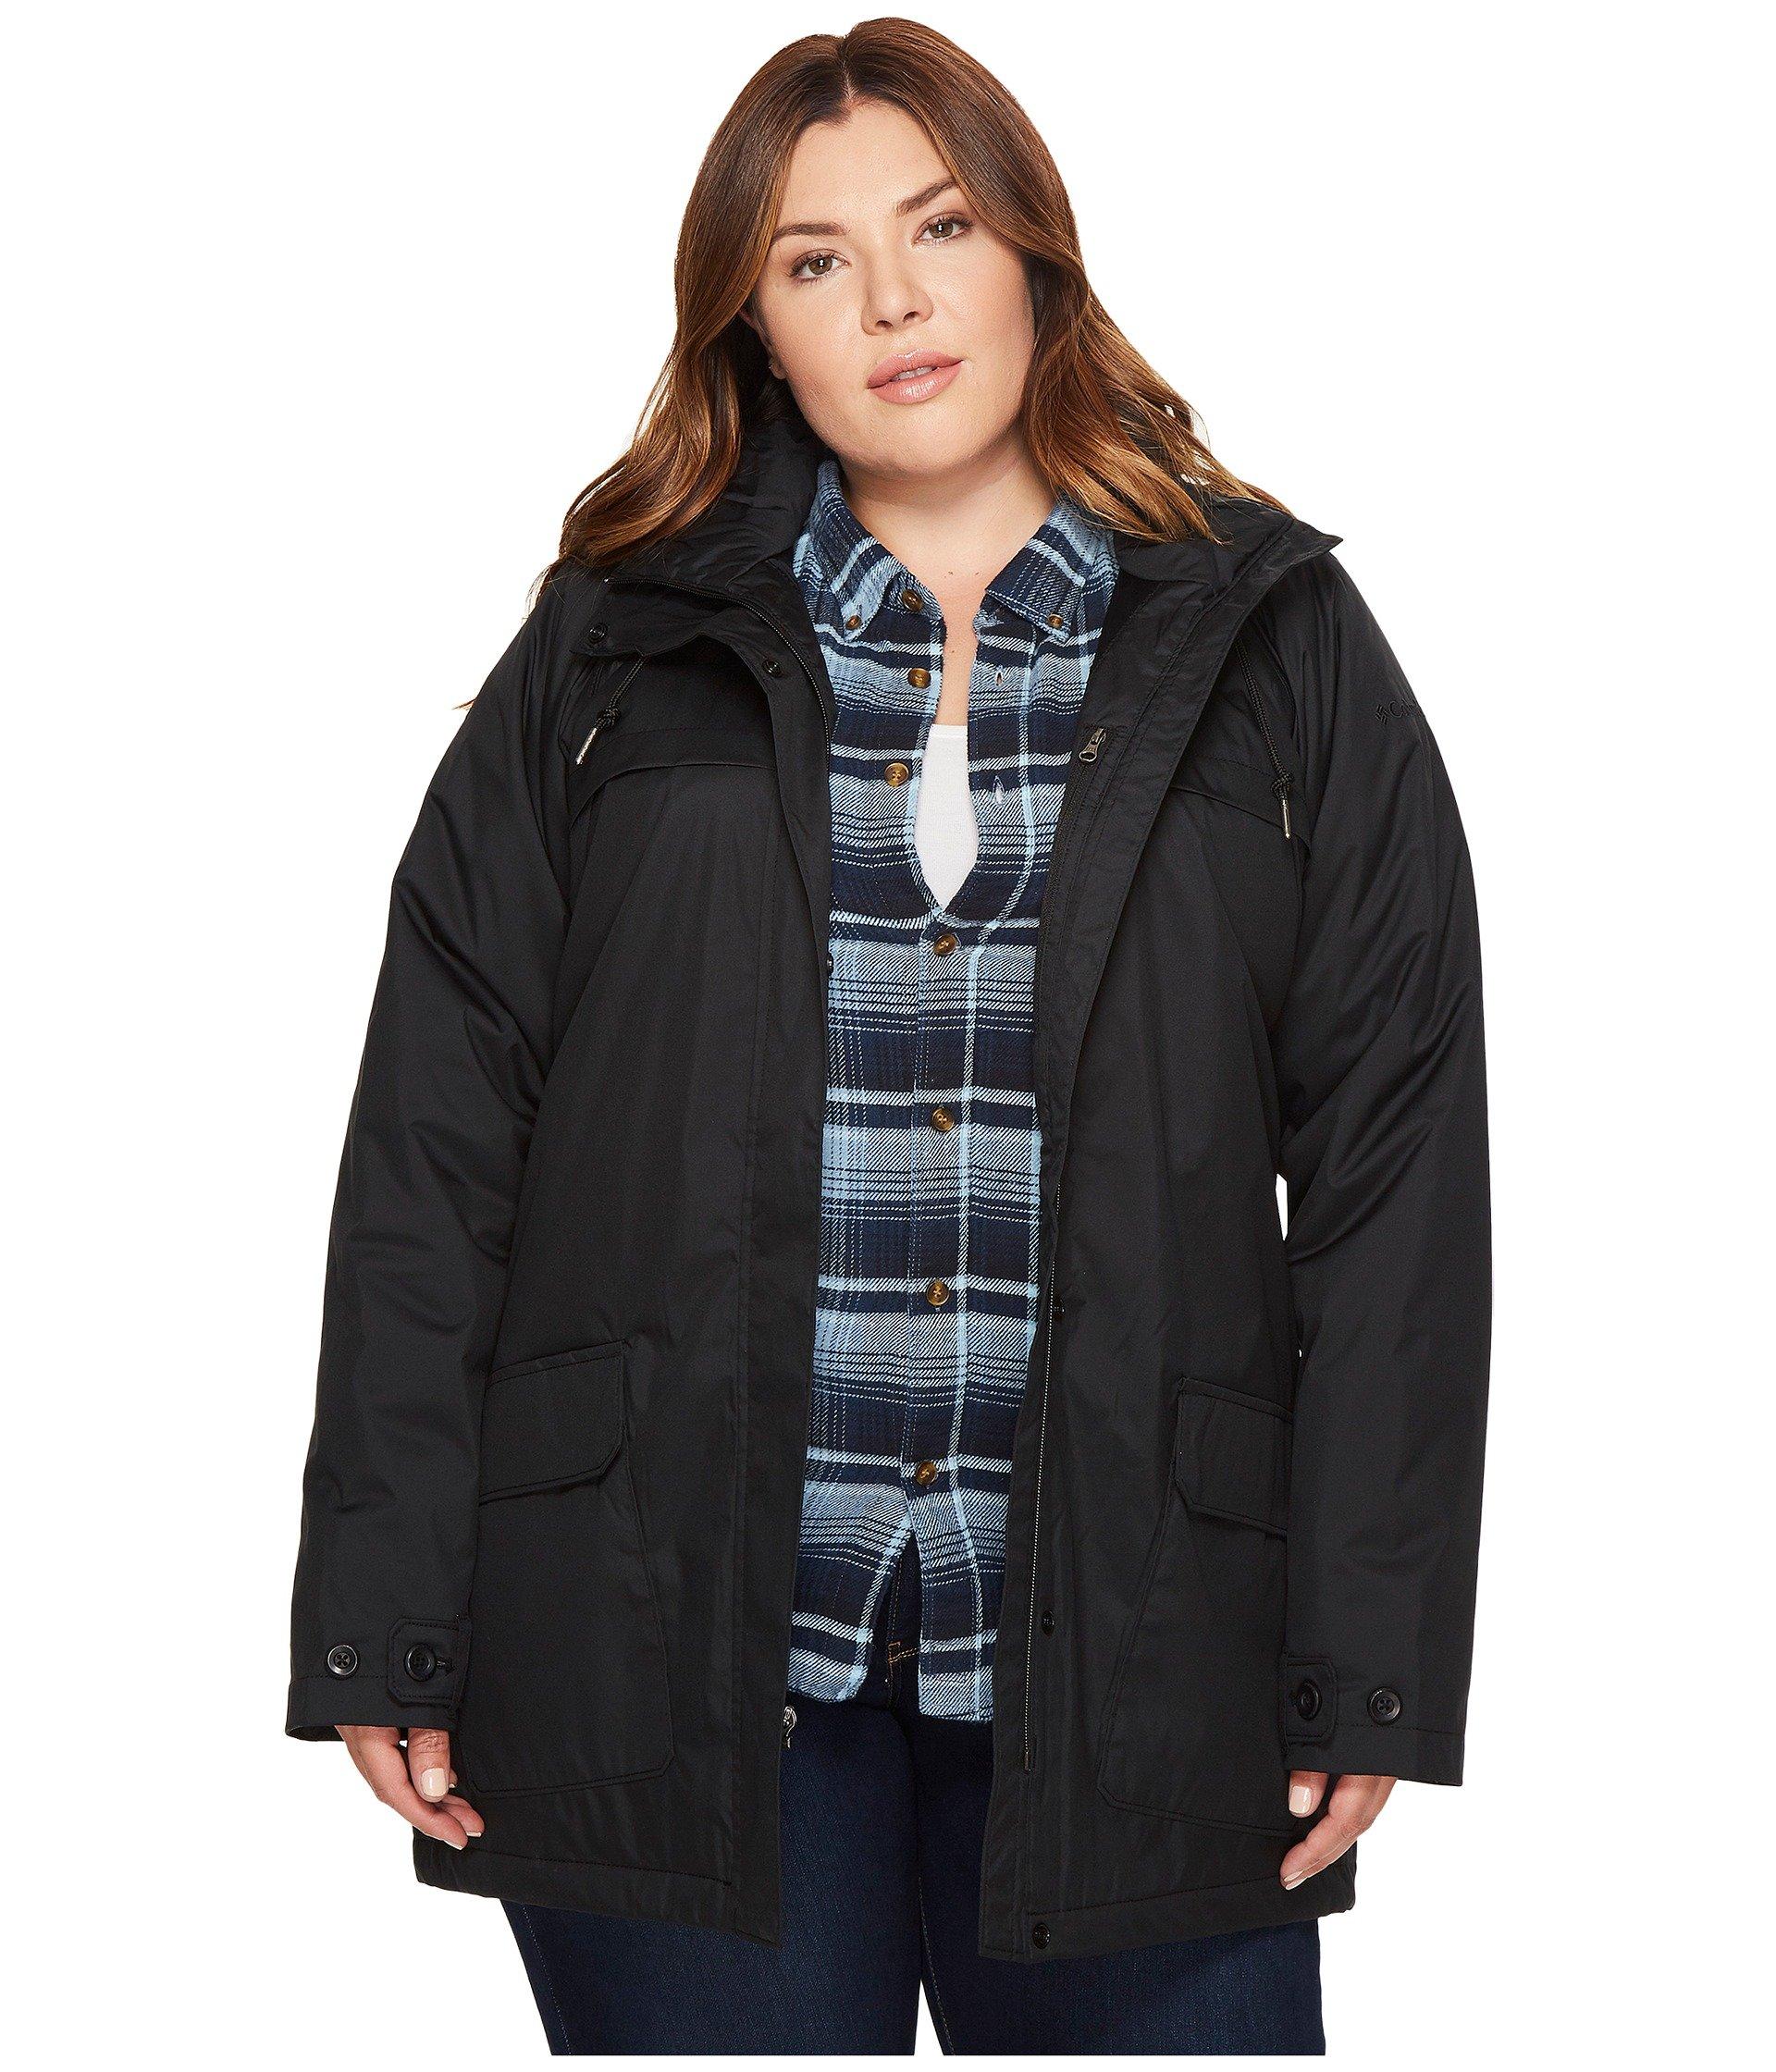 Columbia, Clothing, Women, Plus Size | Shipped Free at Zappos